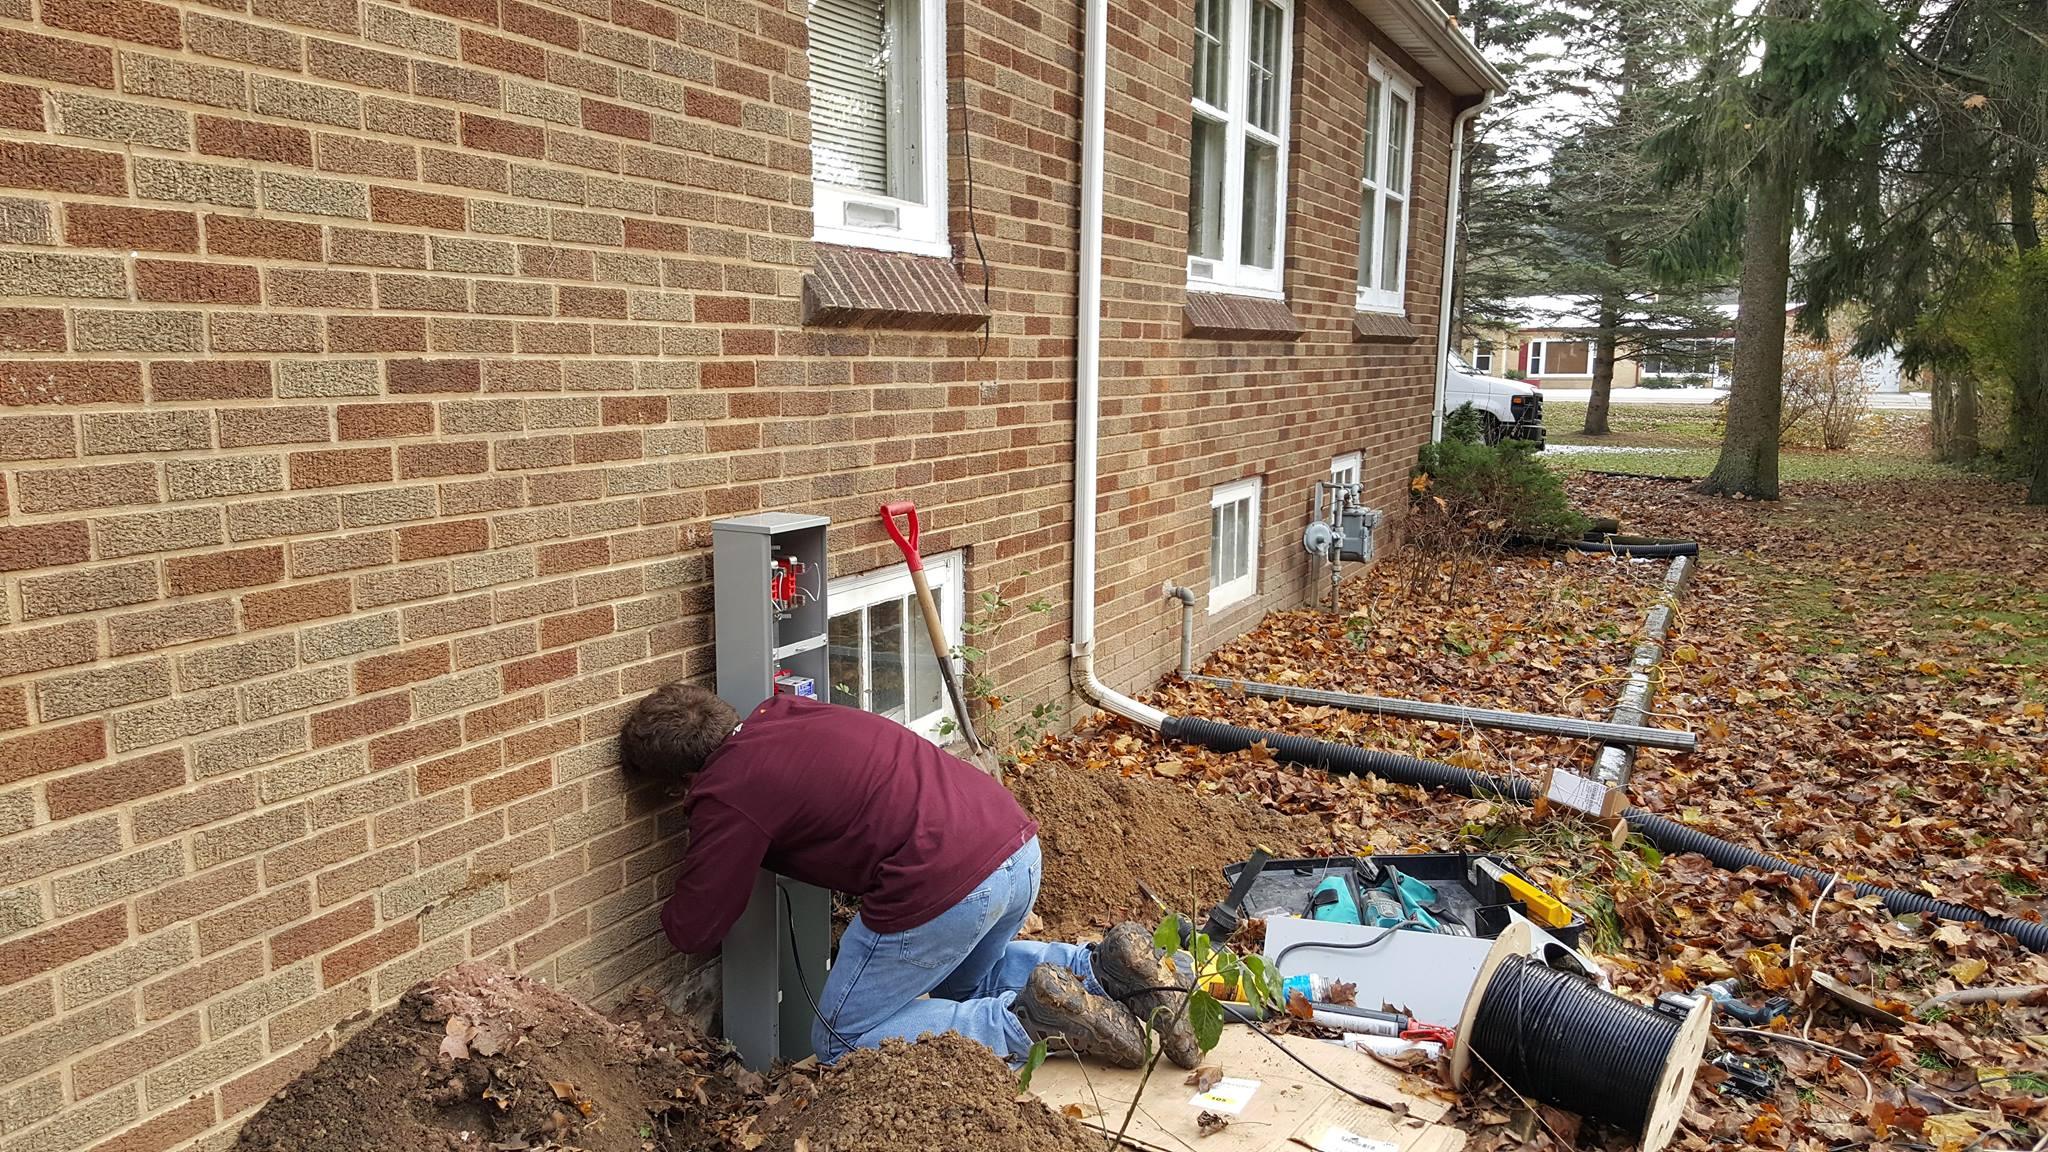 Service update - New meter pedestal going in today